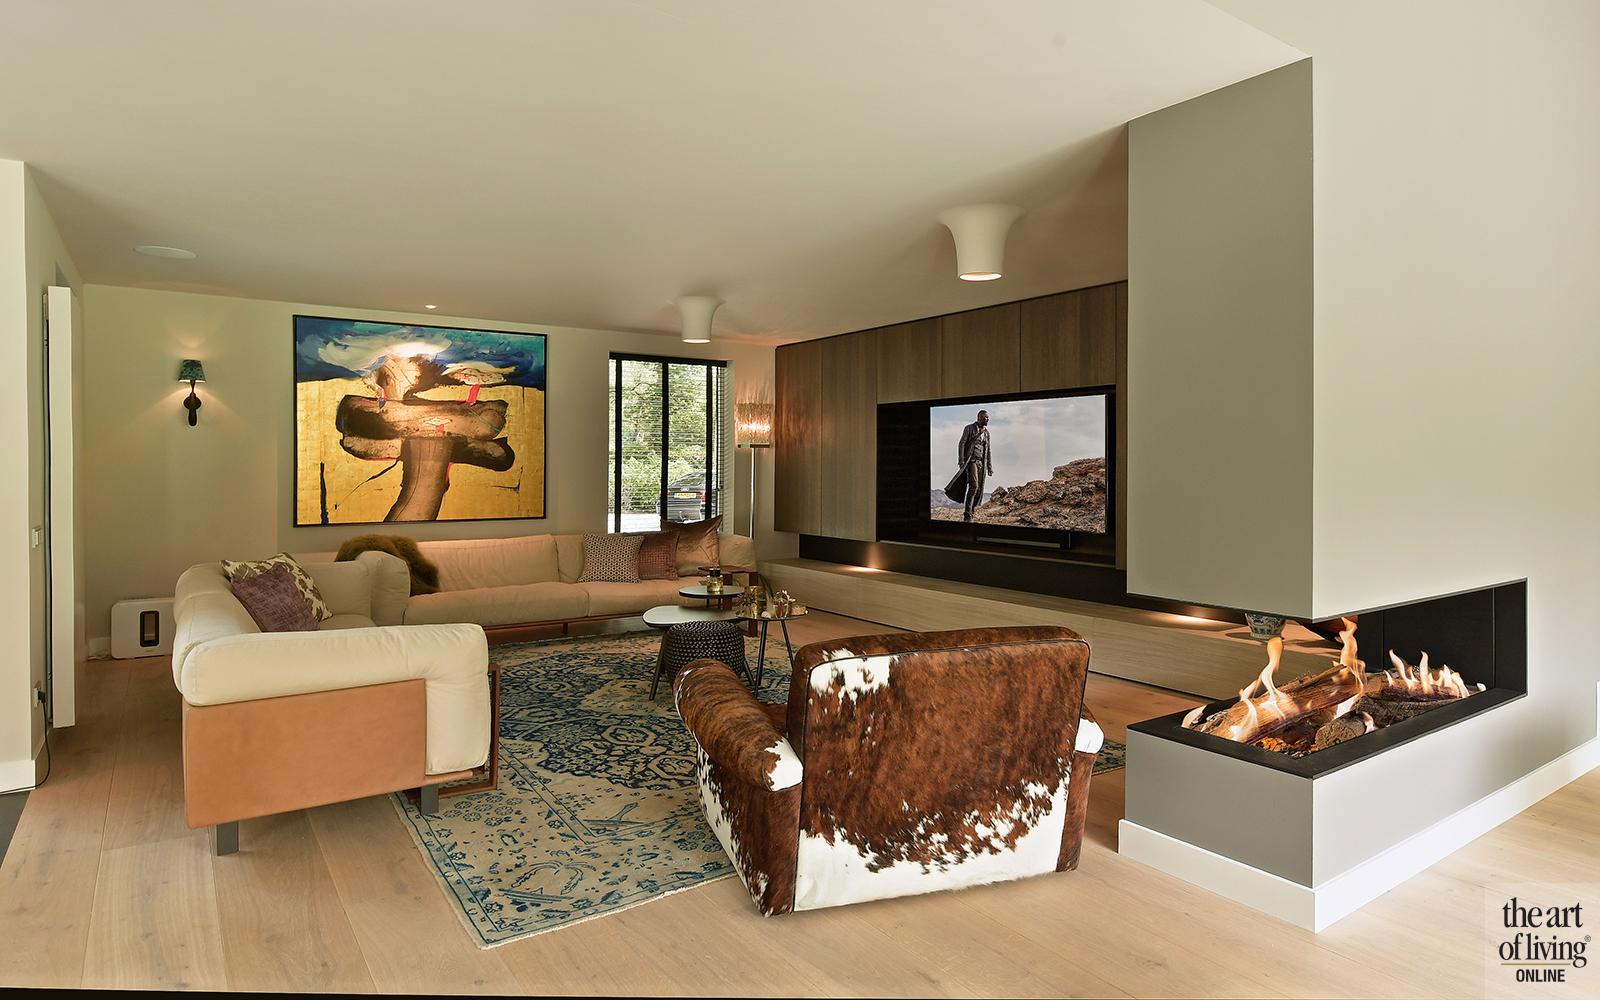 Moderne villa, Drijvers, Interieur, Exterieur, Moderne Architectuur, Villa, Modern interieur, Woonkamer, Livingroom, Design Meubels, Home cinema, Thuisbioscoop